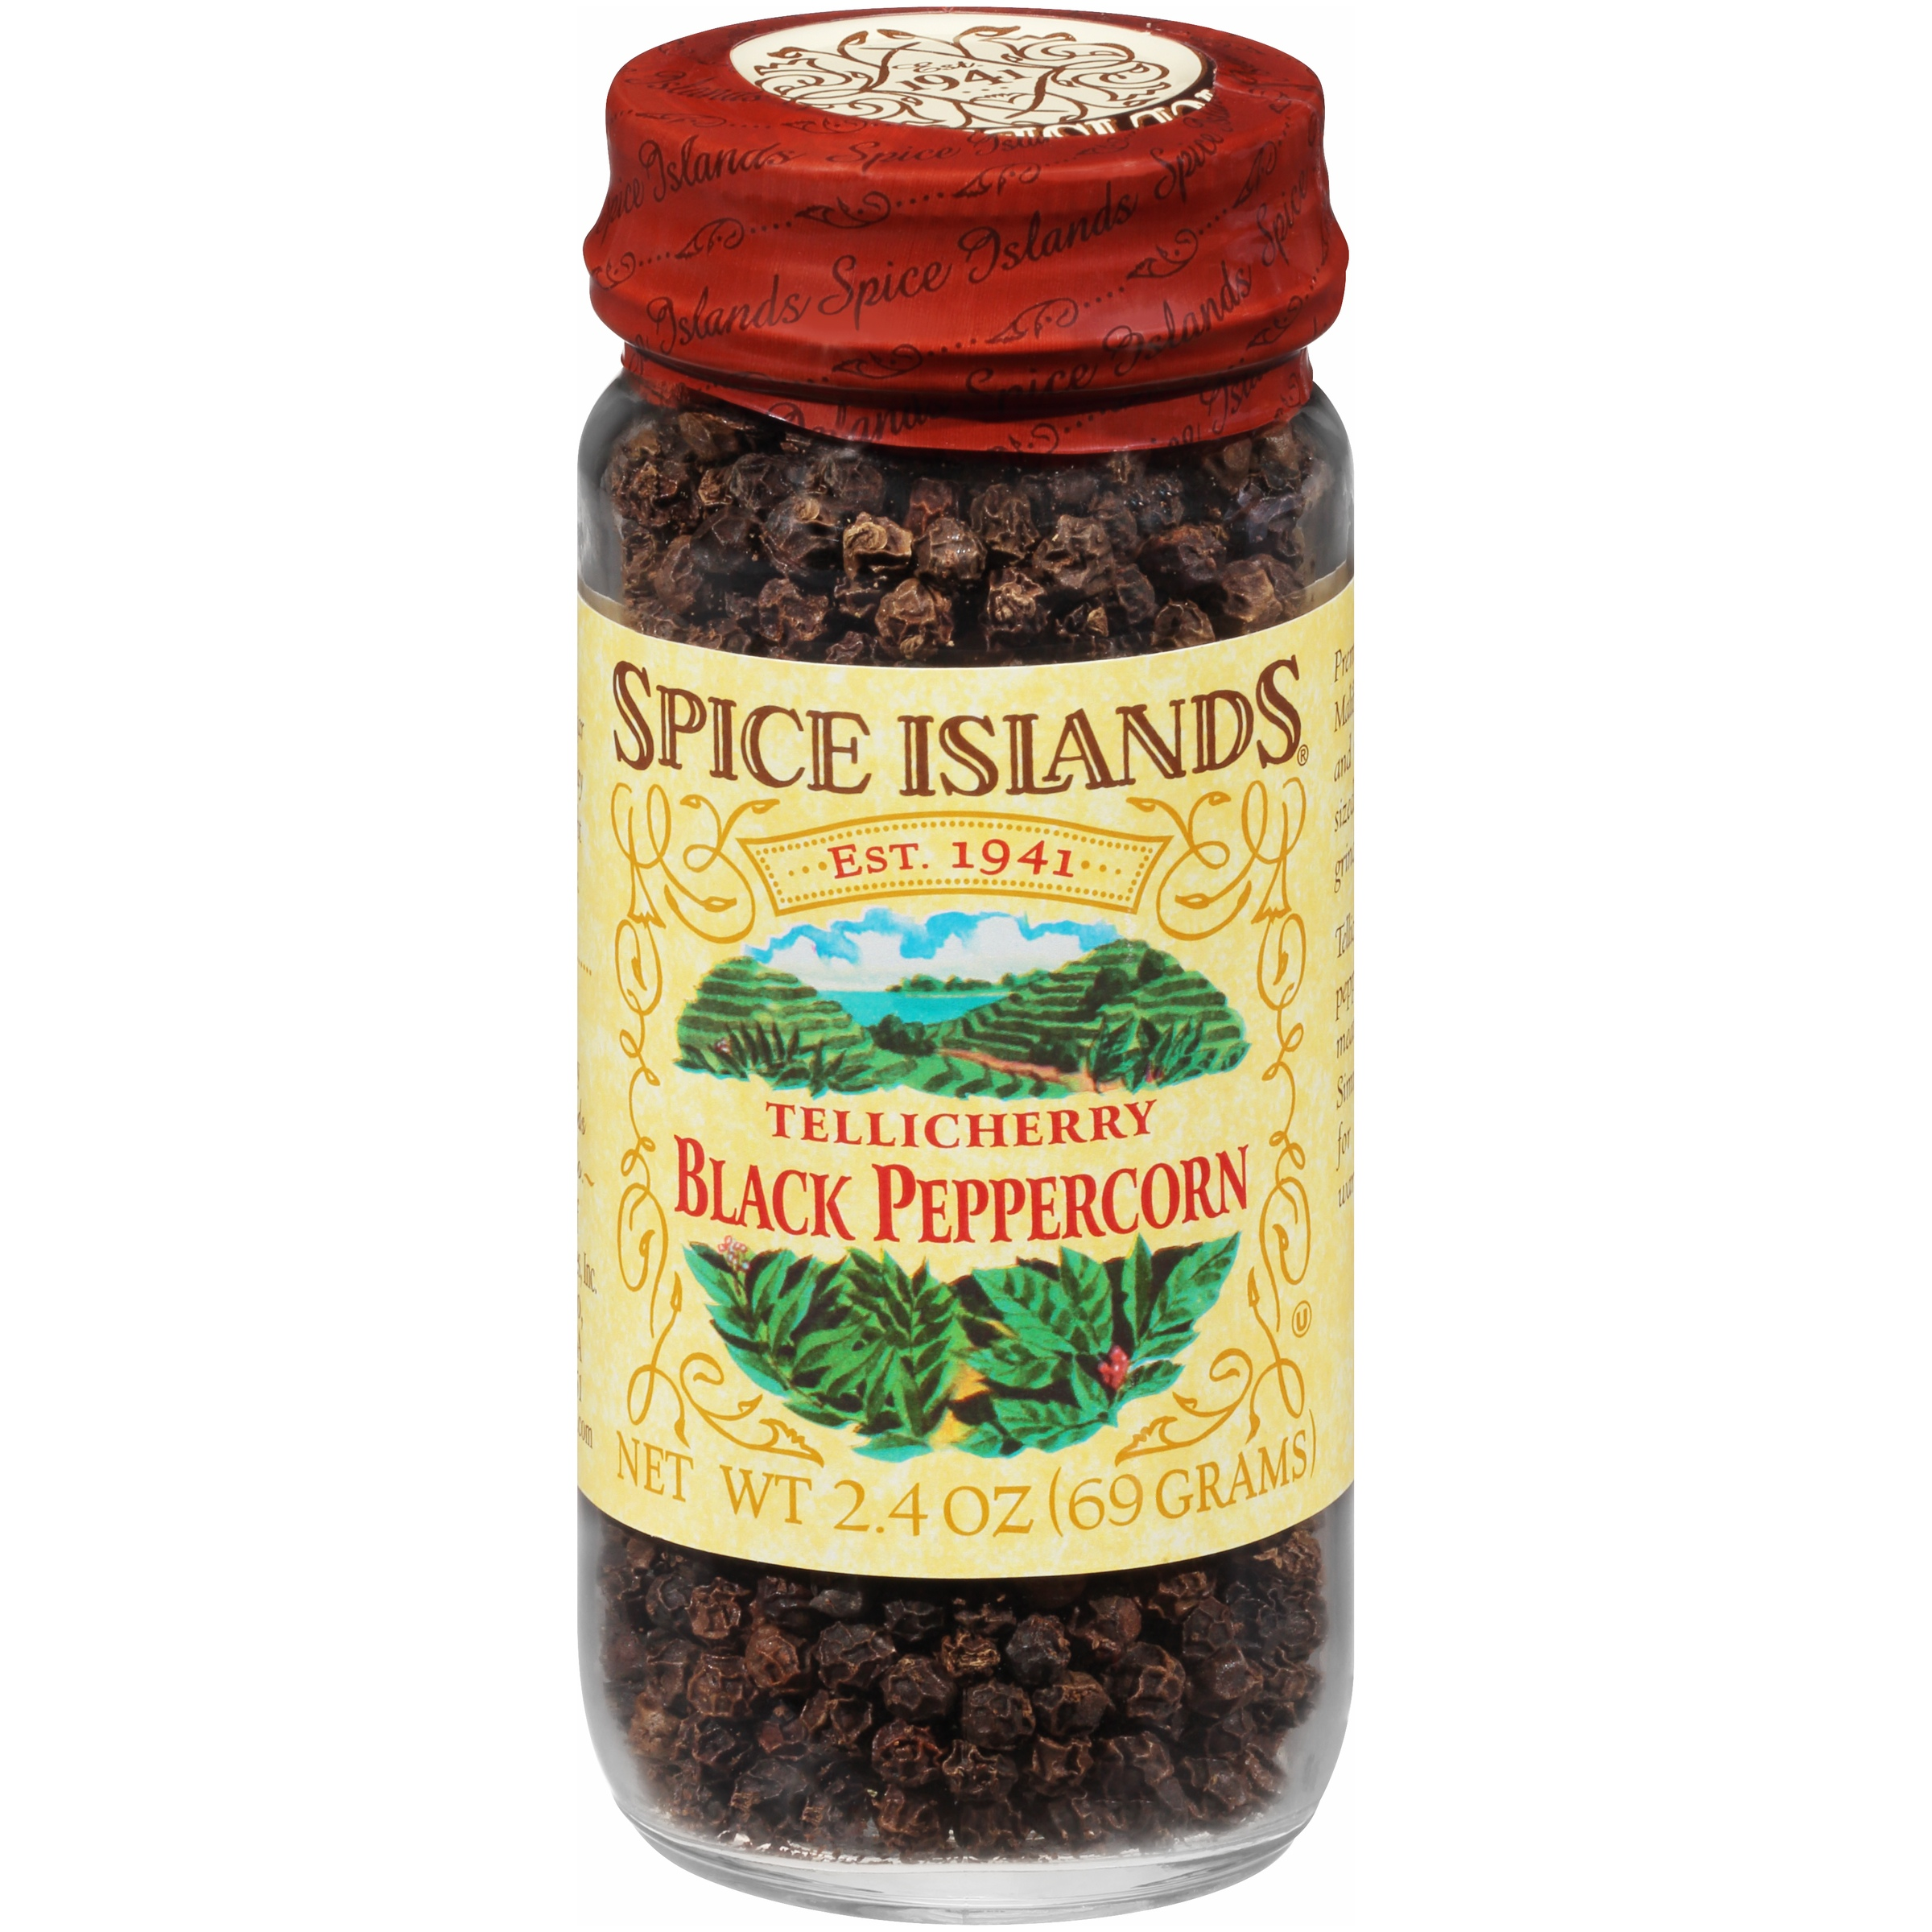 Spice Islands® Tellicherry Black Peppercorn 2.4 oz. Jar